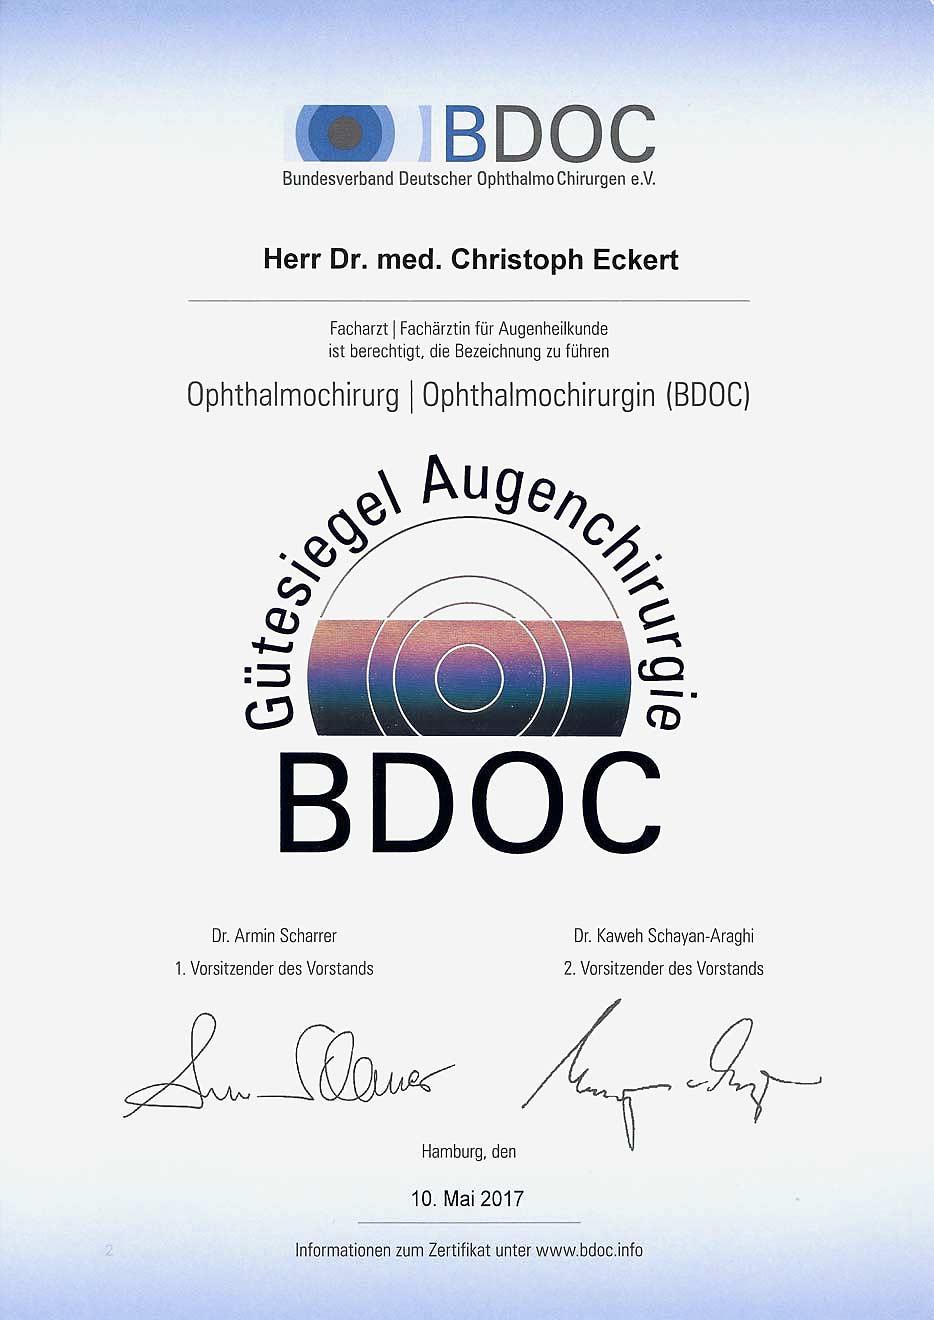 BDOC Gütesiegel Dr. C. Eckert